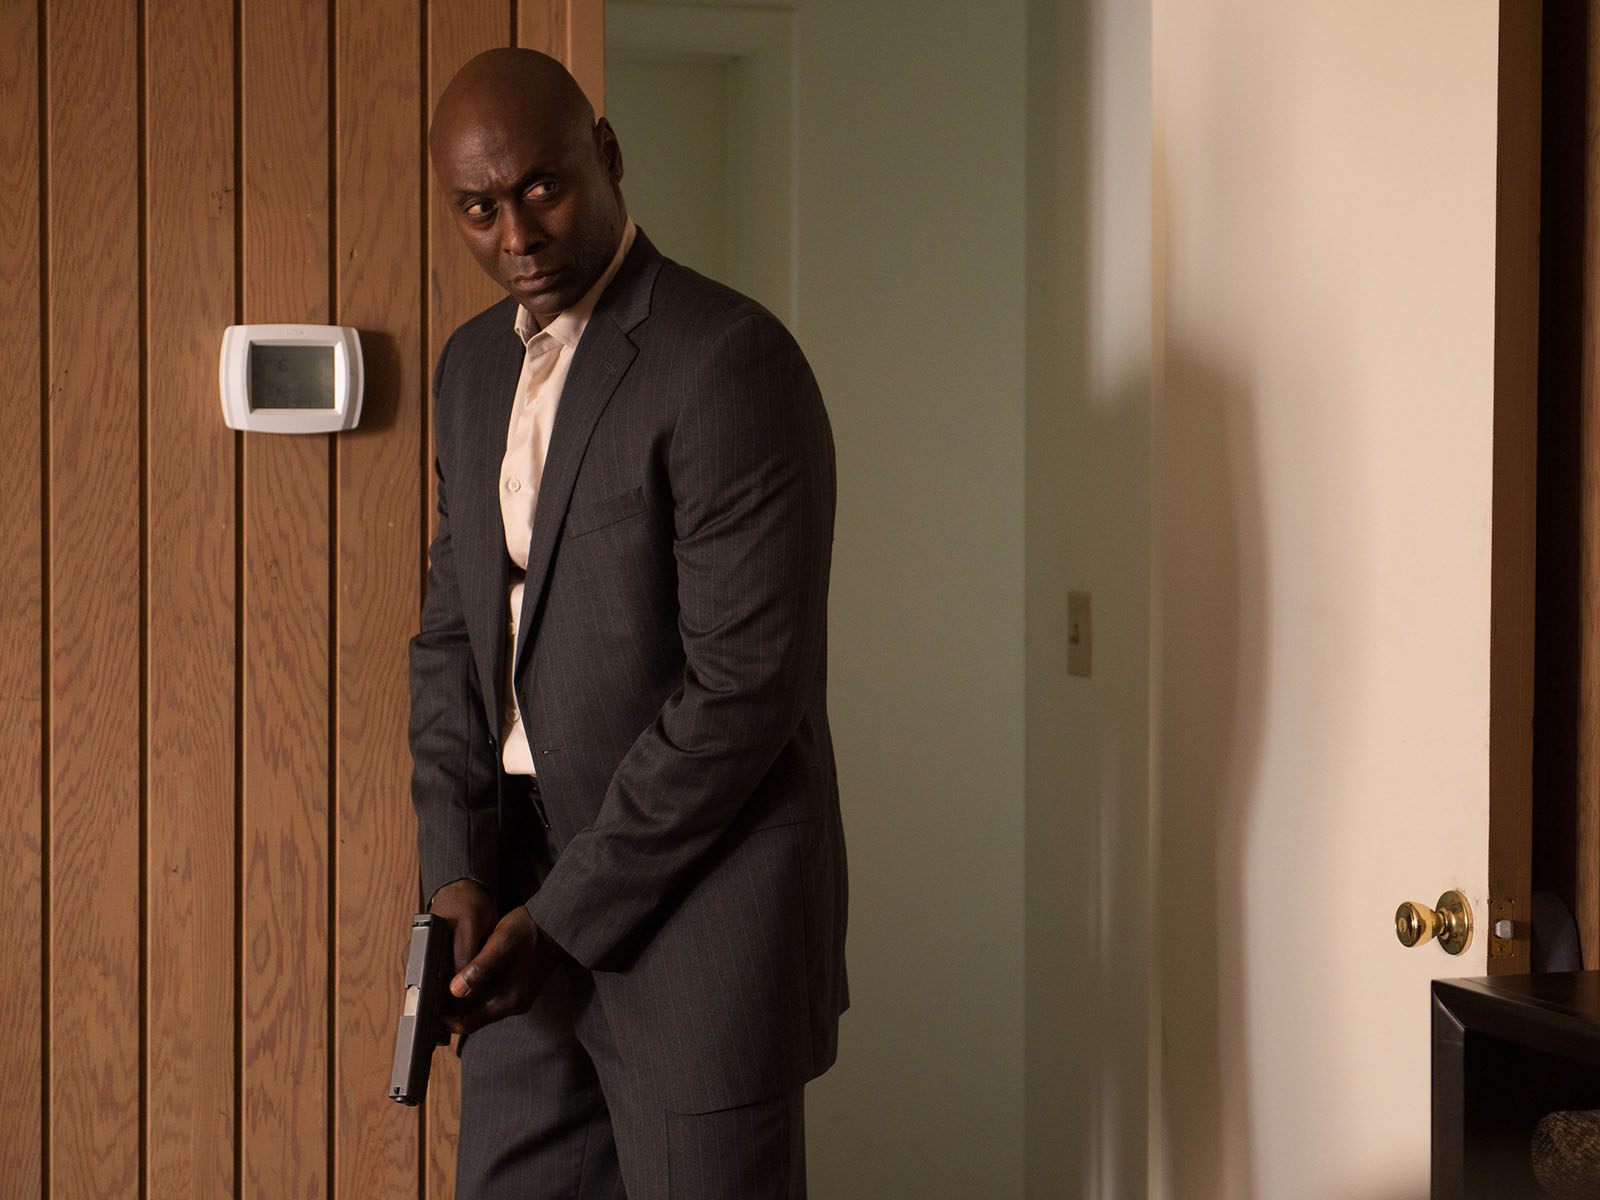 Harry Bosch: Exit Time | Season 2 | Episode 7